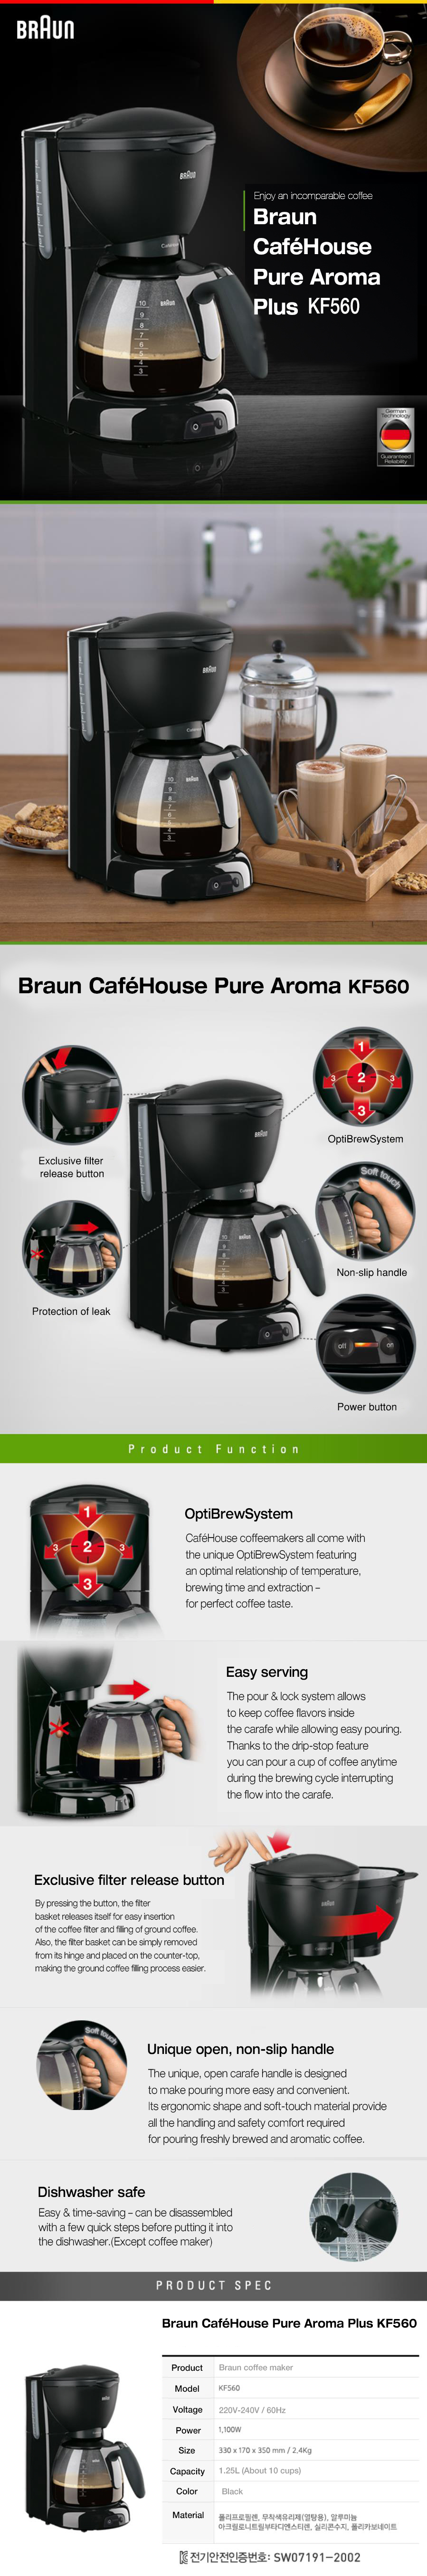 Braun Coffee Maker Kf560 : NEW BRAUN CAFE HOUSE Coffee Maker KF560 1.25L rapidity extraction Black eBay